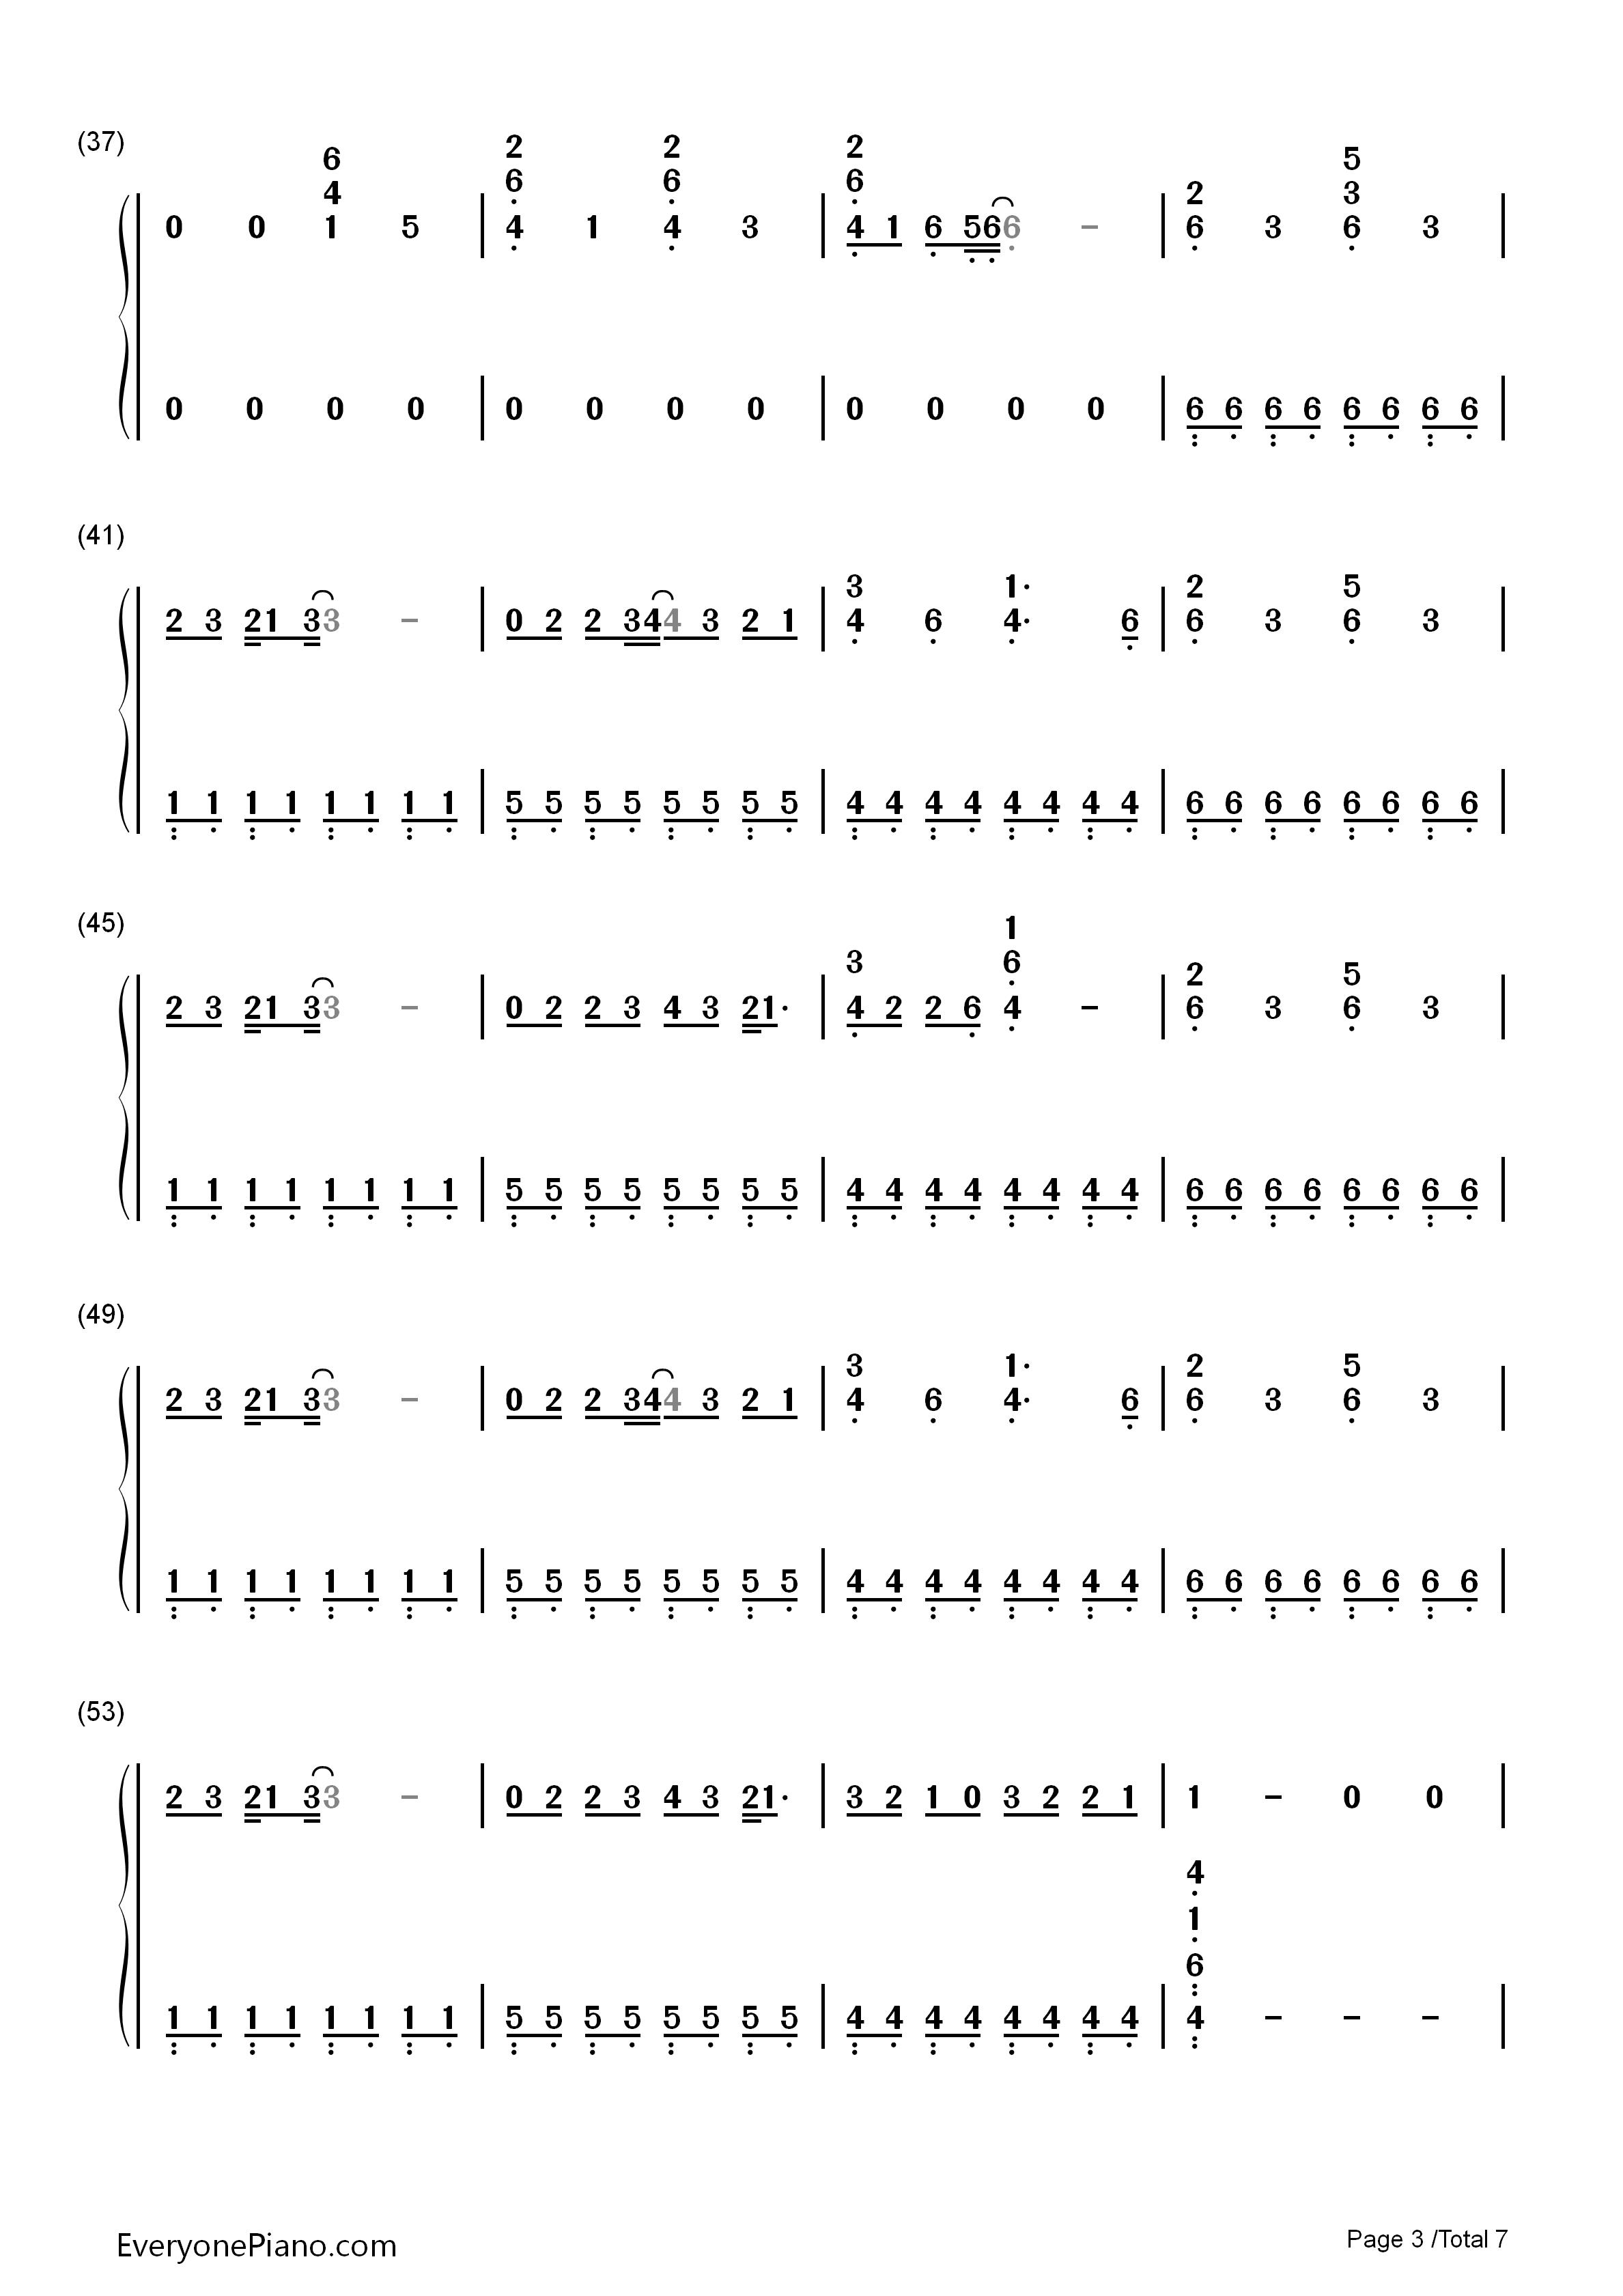 counting stars piano sheet music free pdf